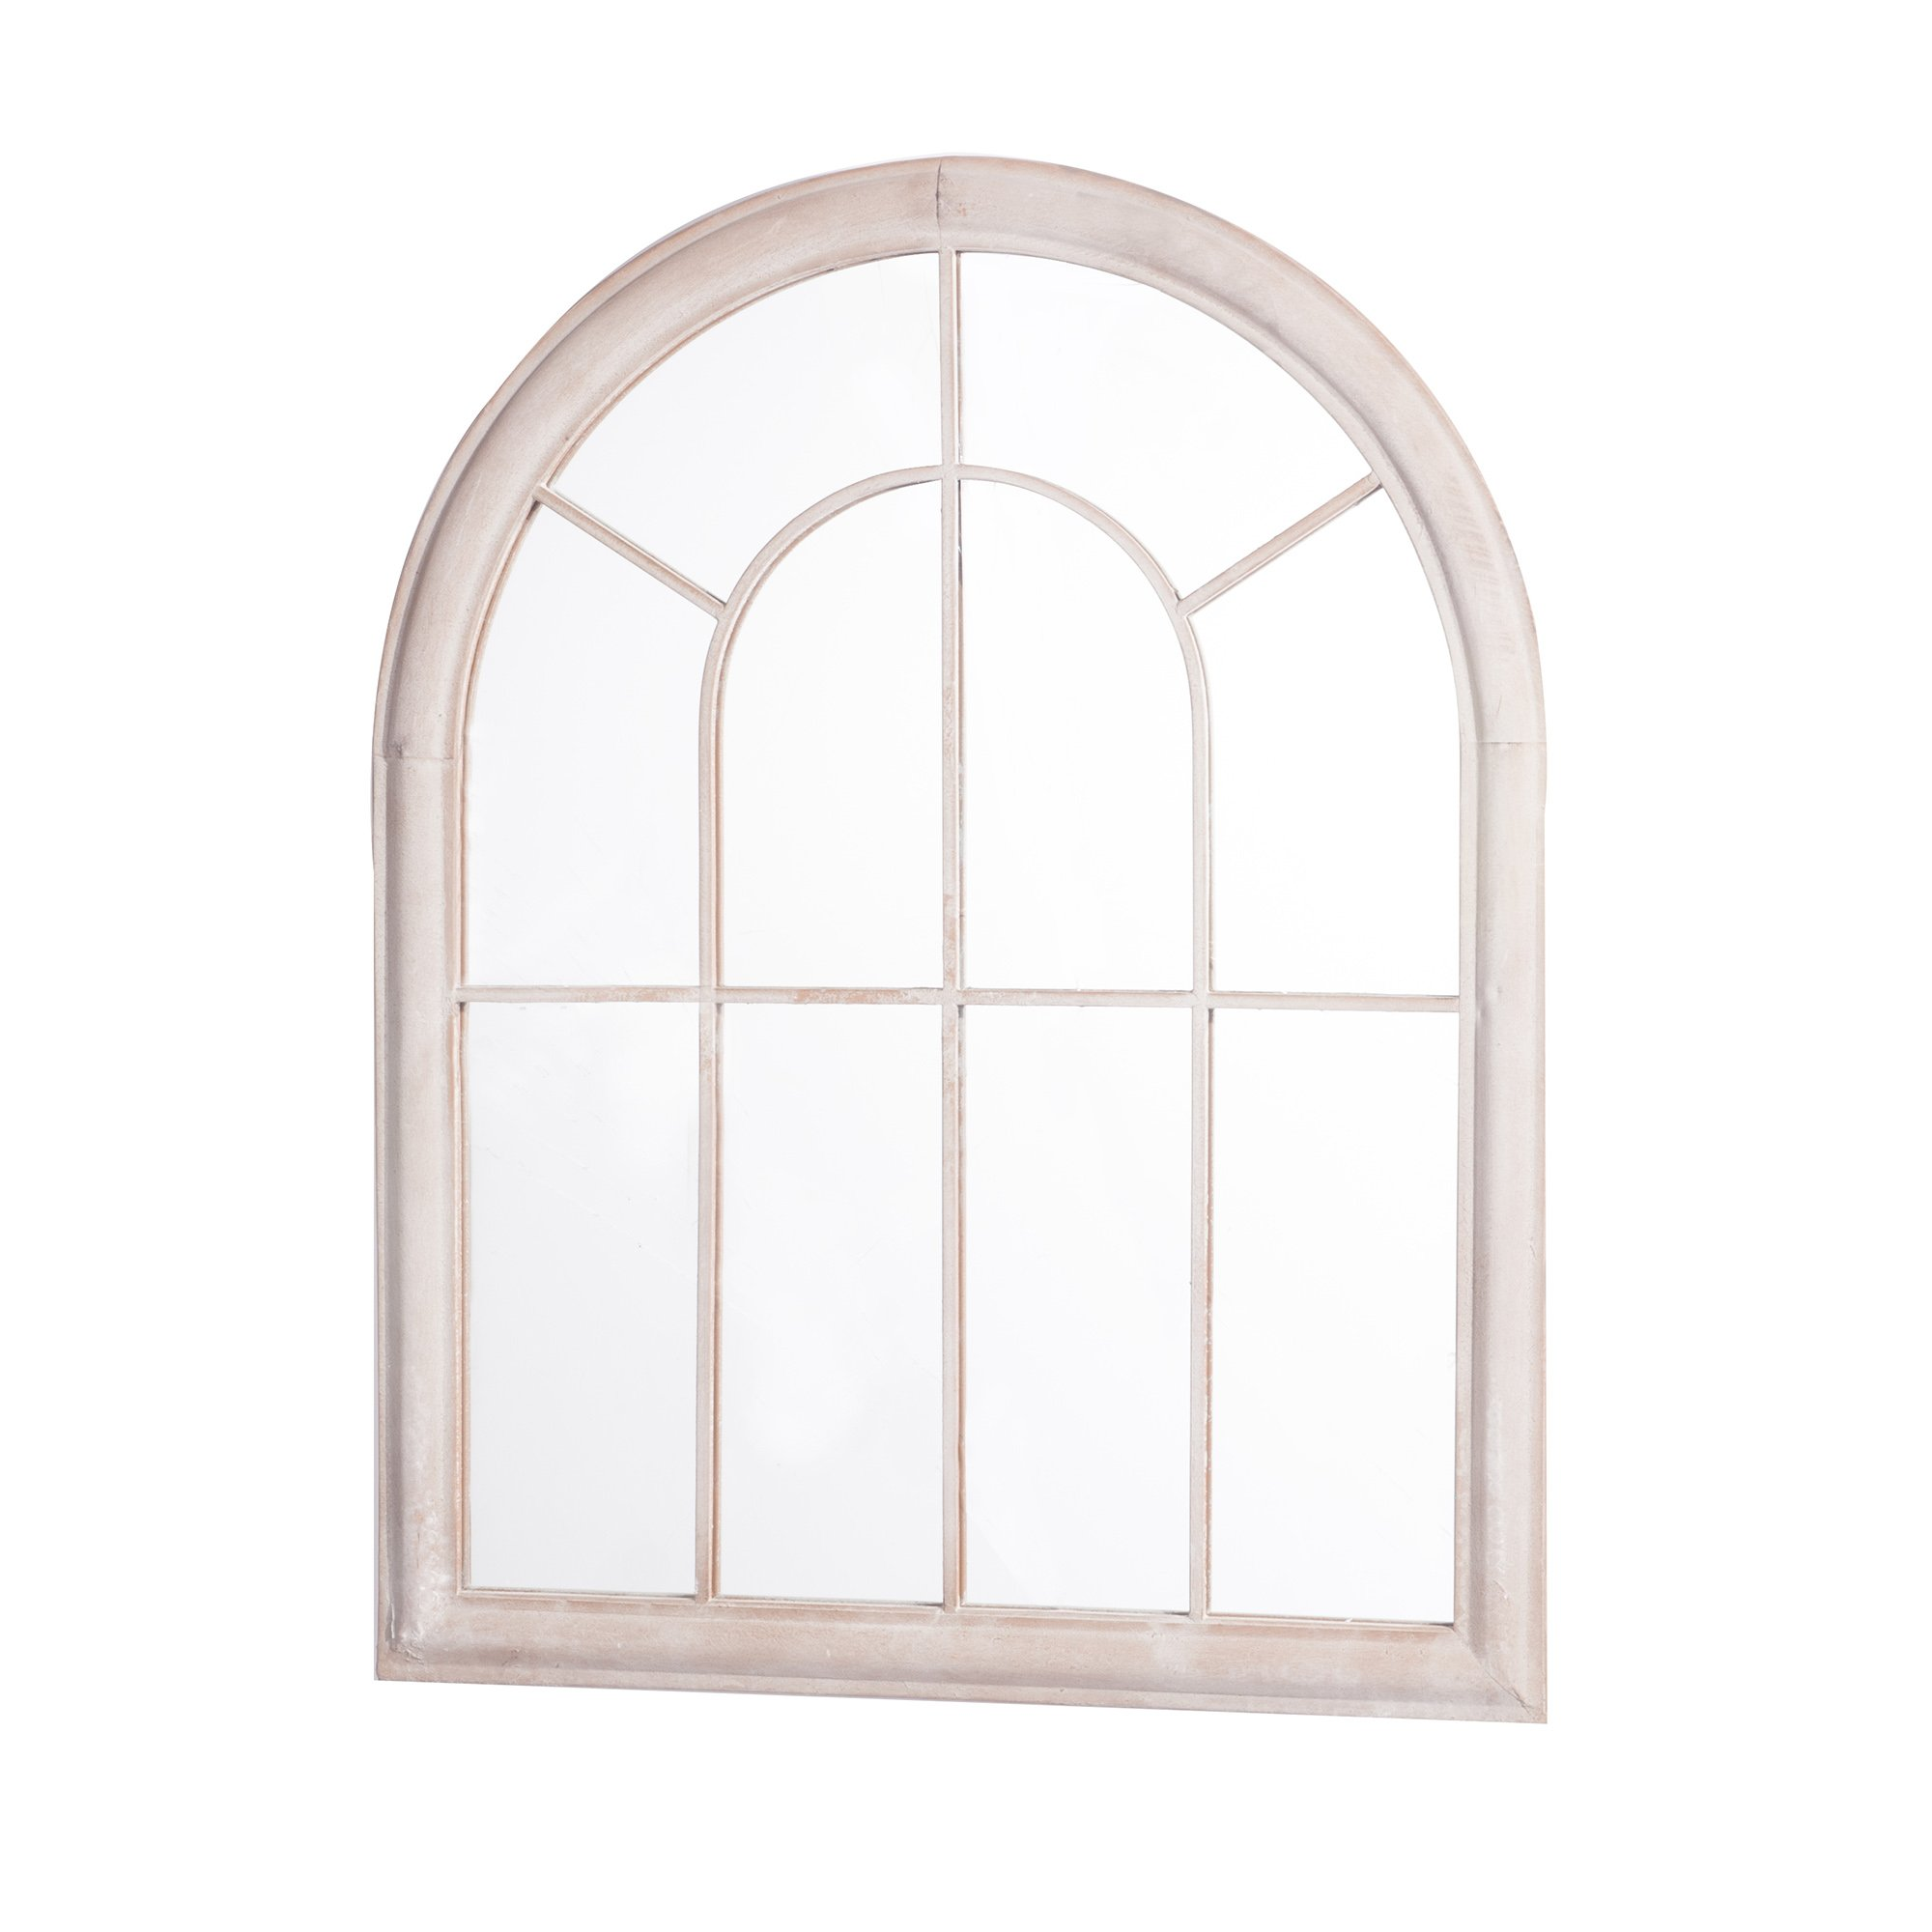 Sunjoy Round Top Windowpane Style Rectangle Mirror